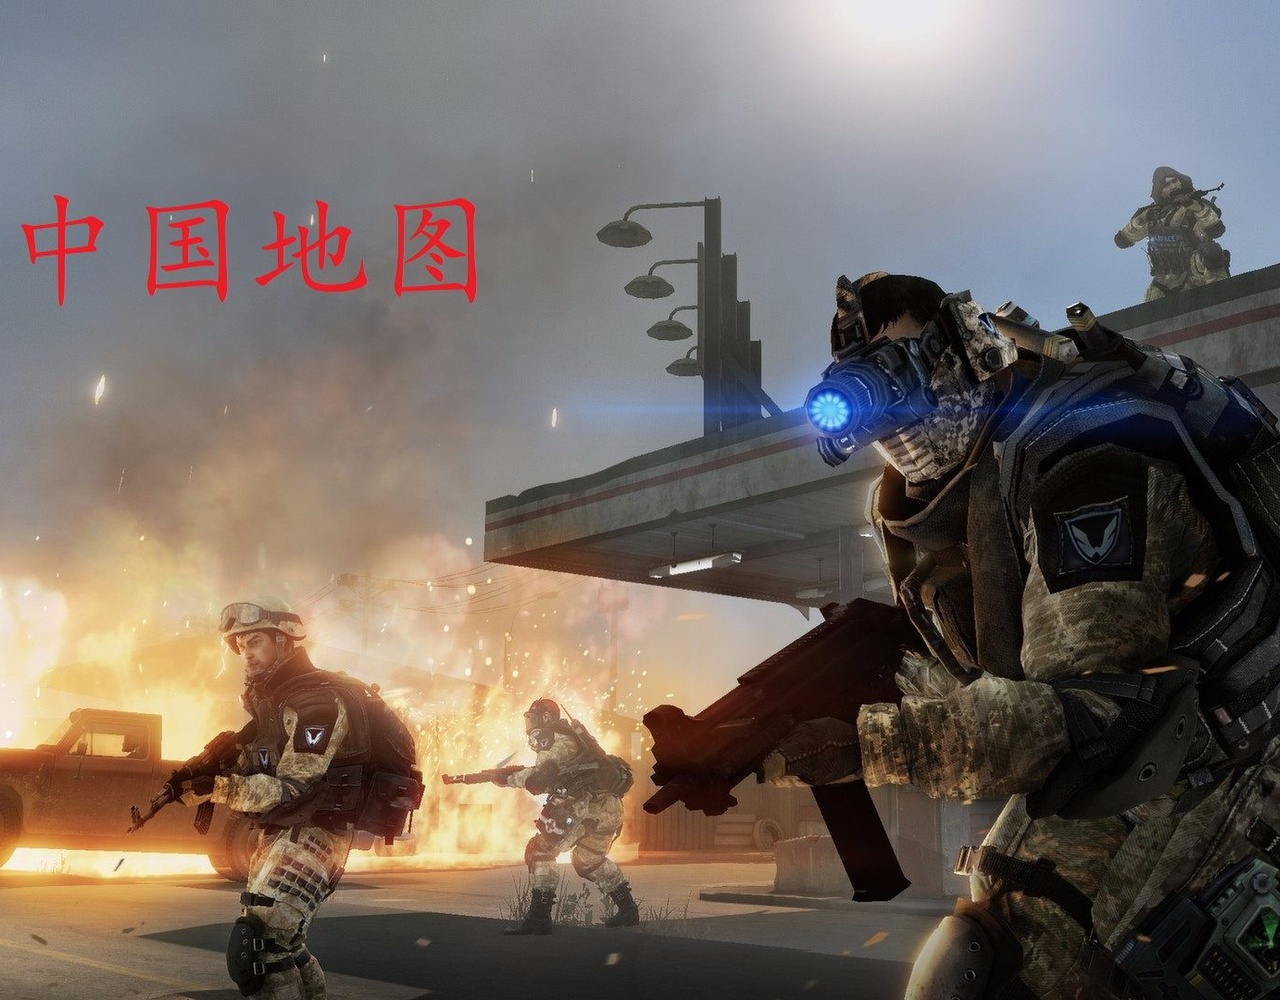 (Warface)我居然在中国用霰弹与狙对撸?!